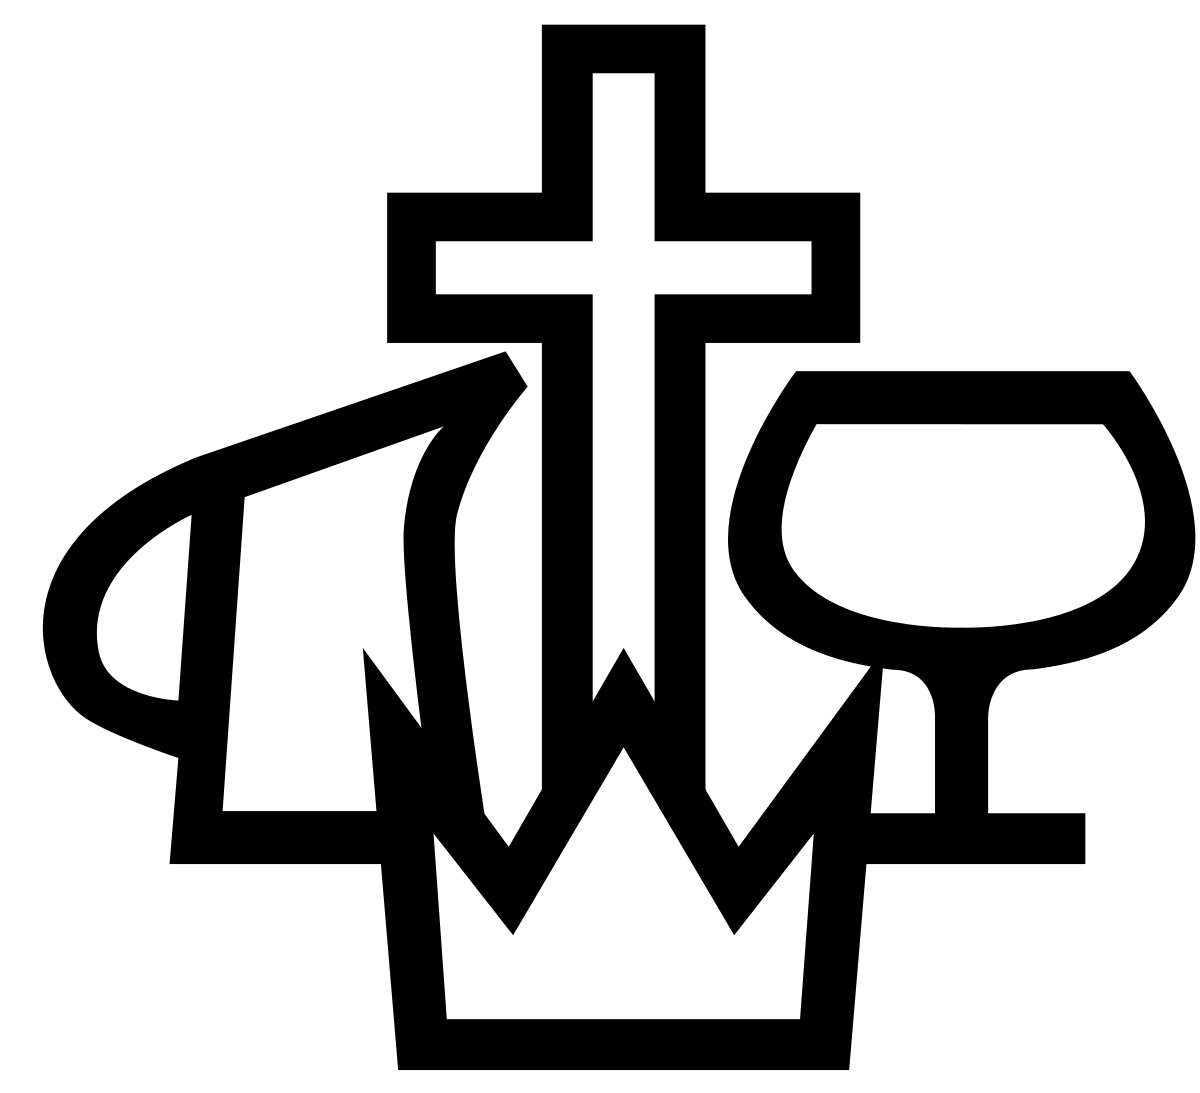 svg black and white download faith svg transparent #112725818